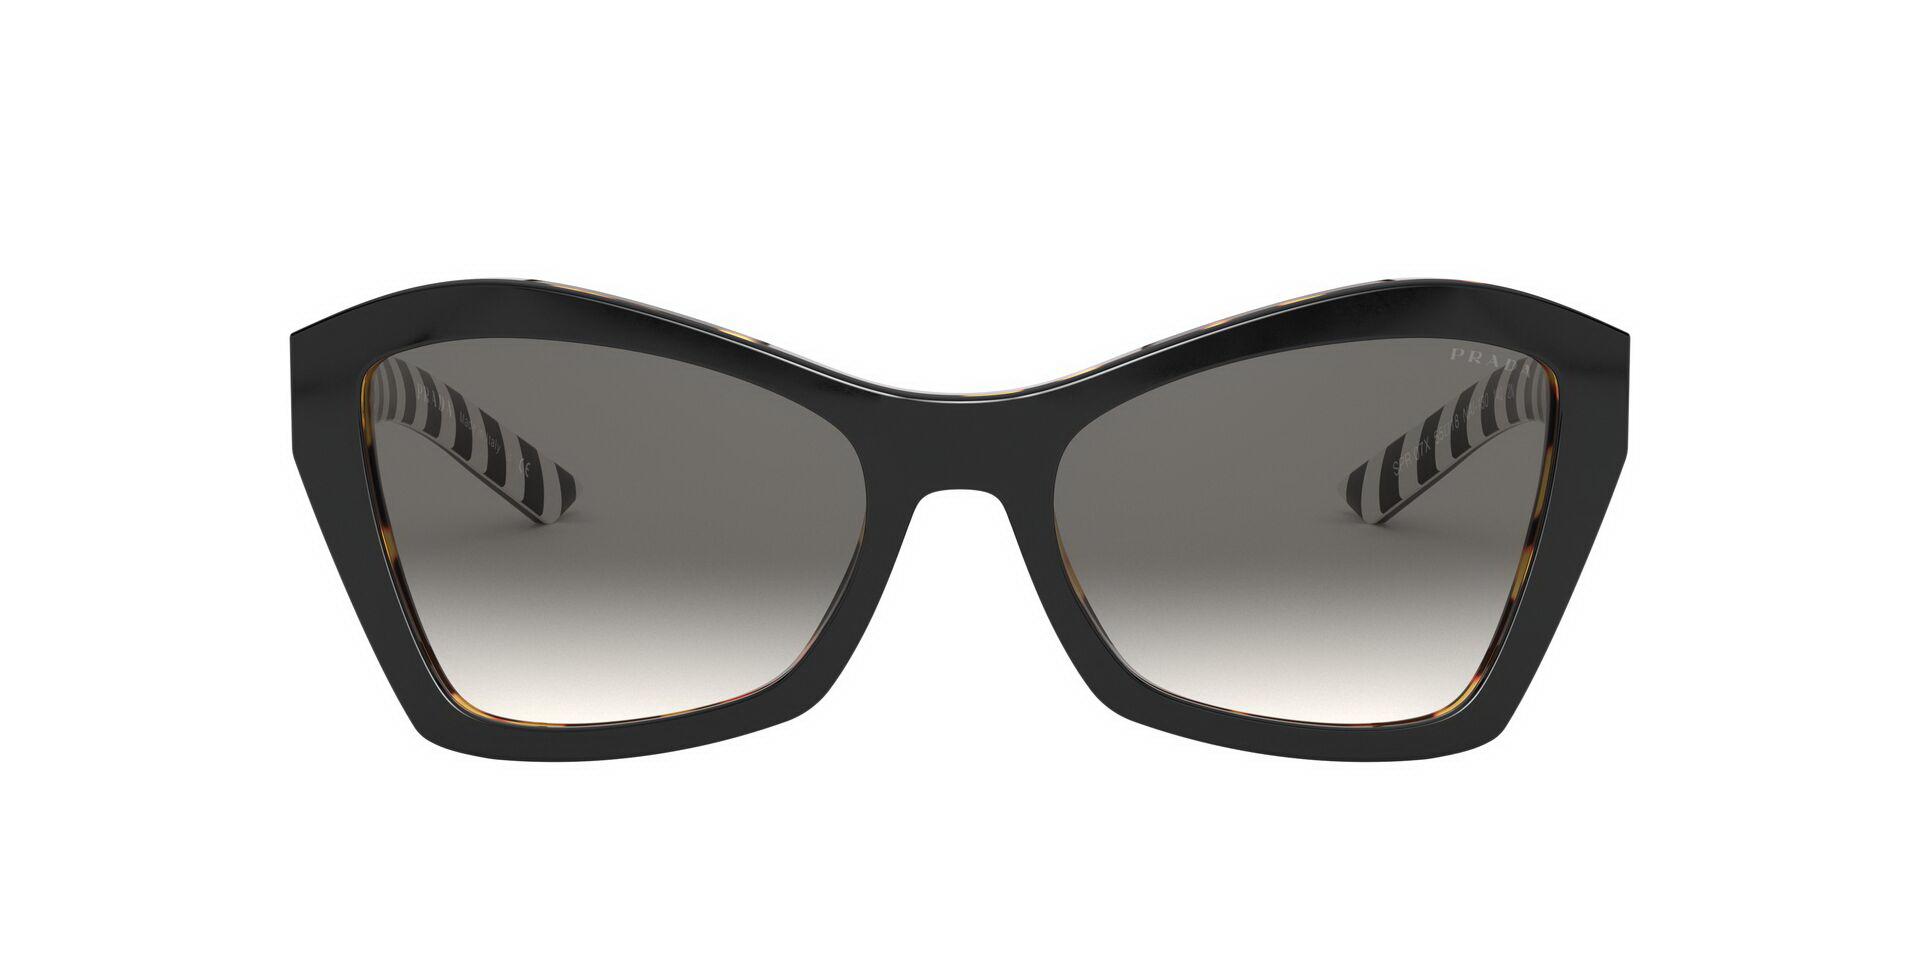 Солнцезащитные очки Очки с/з PRADA 0PR 07XS NAI130 фото